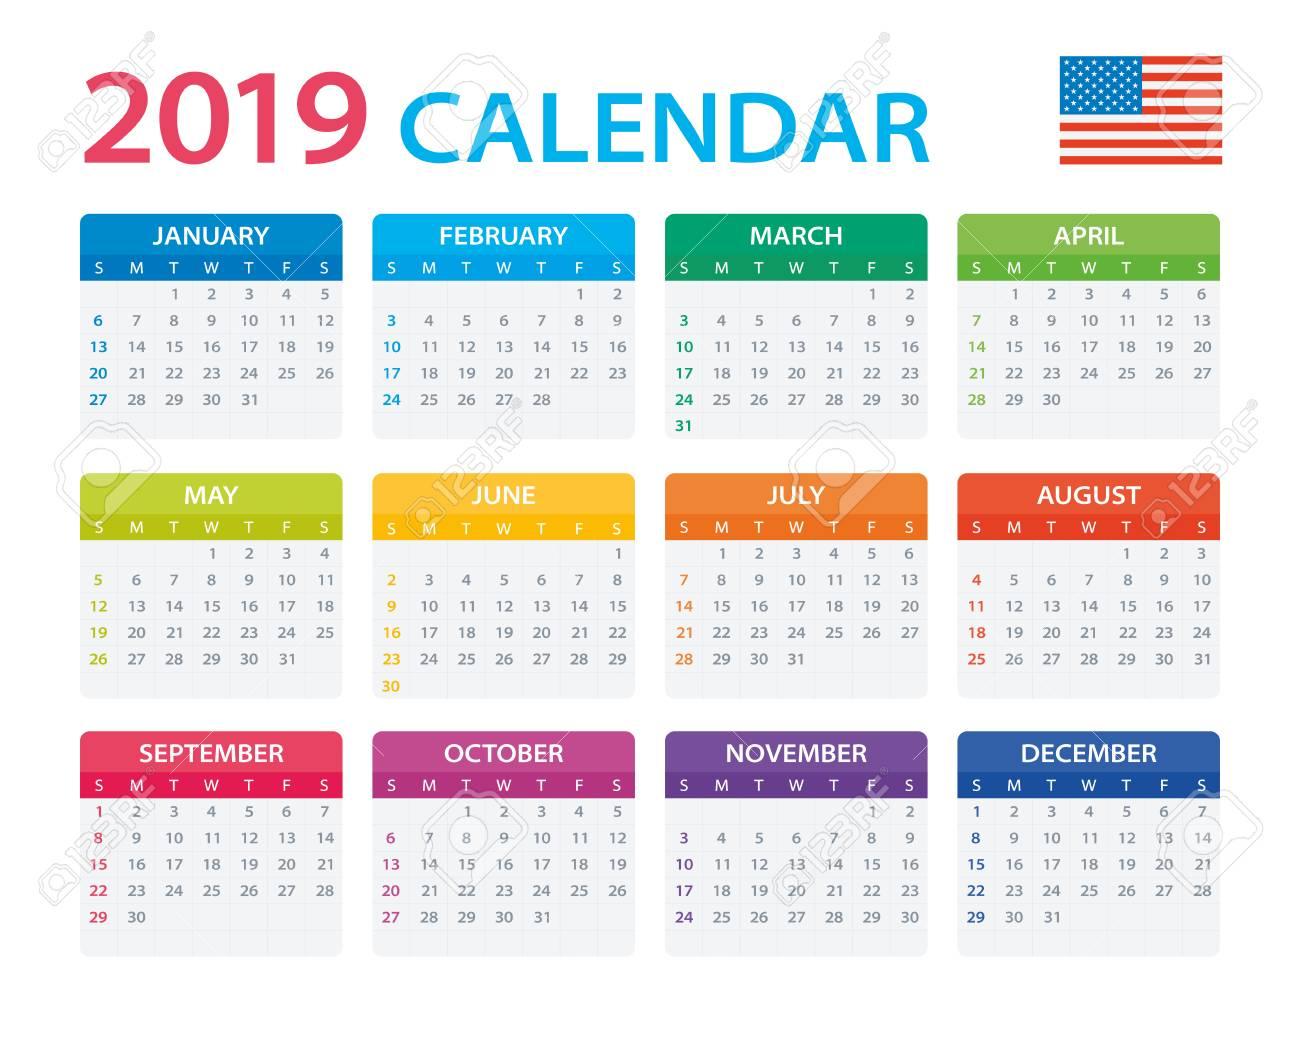 American 2019 Calendar Calendar 2019   American Version   Vector Illustration Royalty